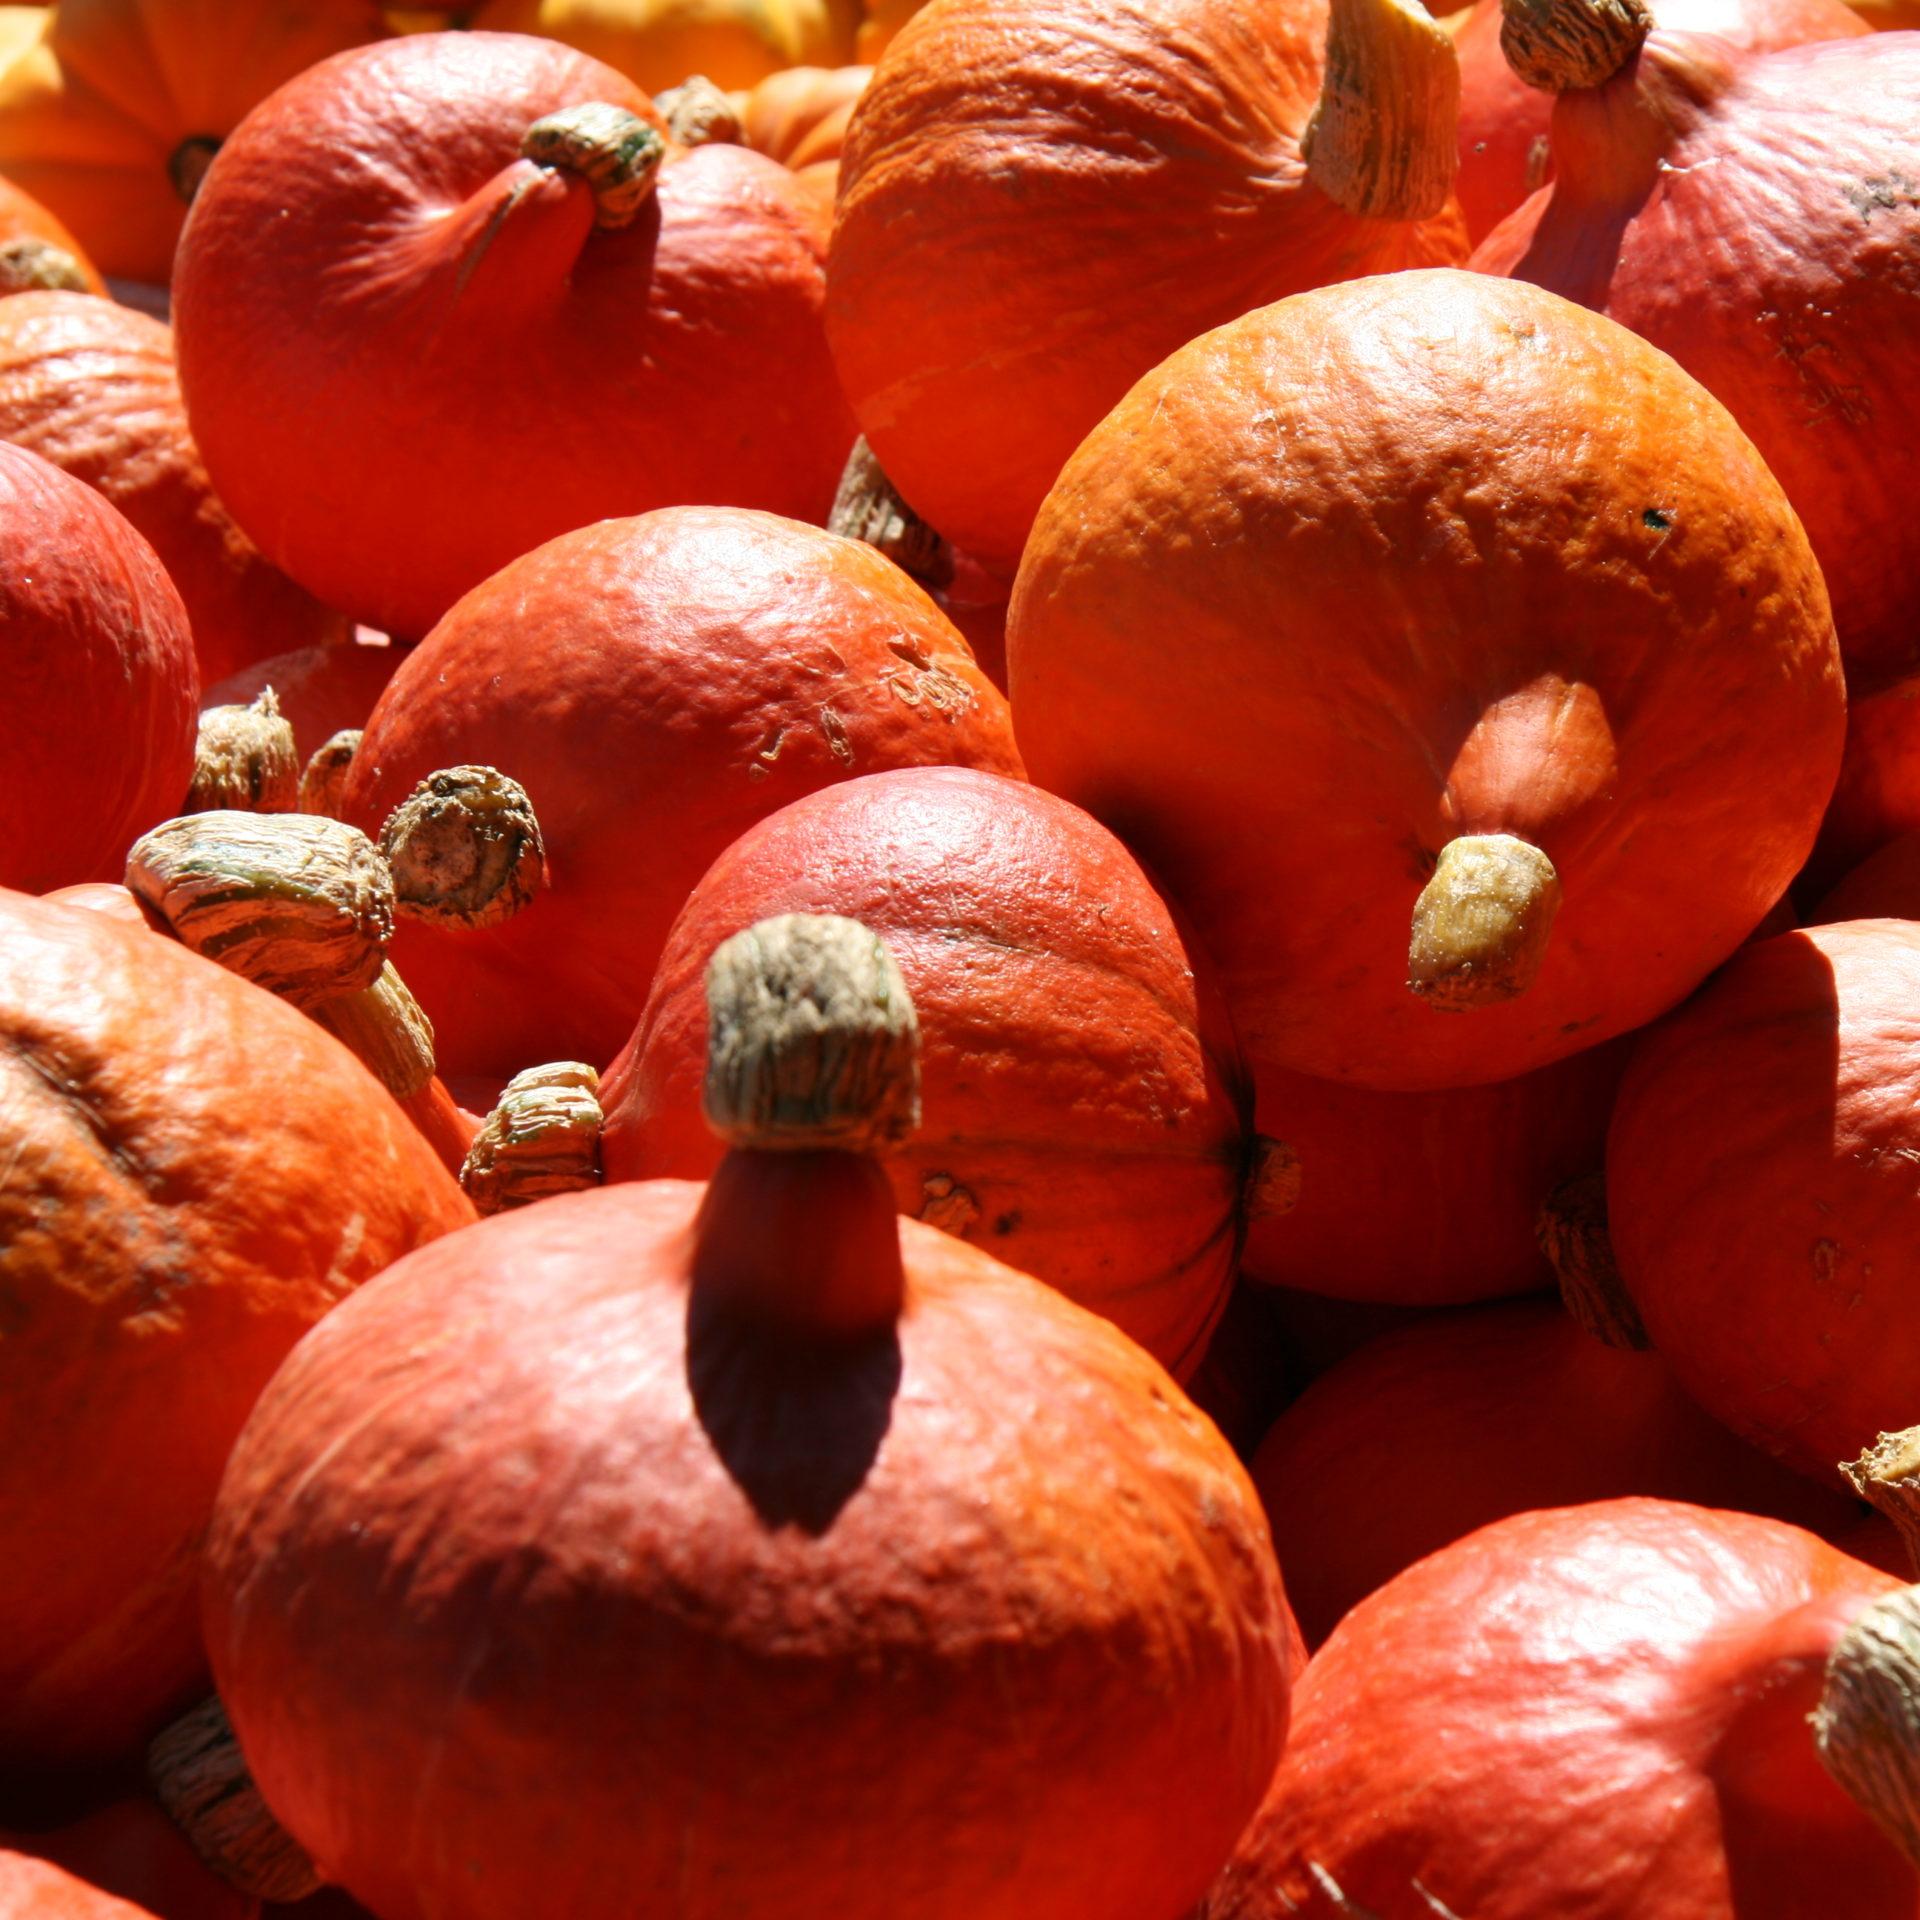 Kürbis Oranger Knirps